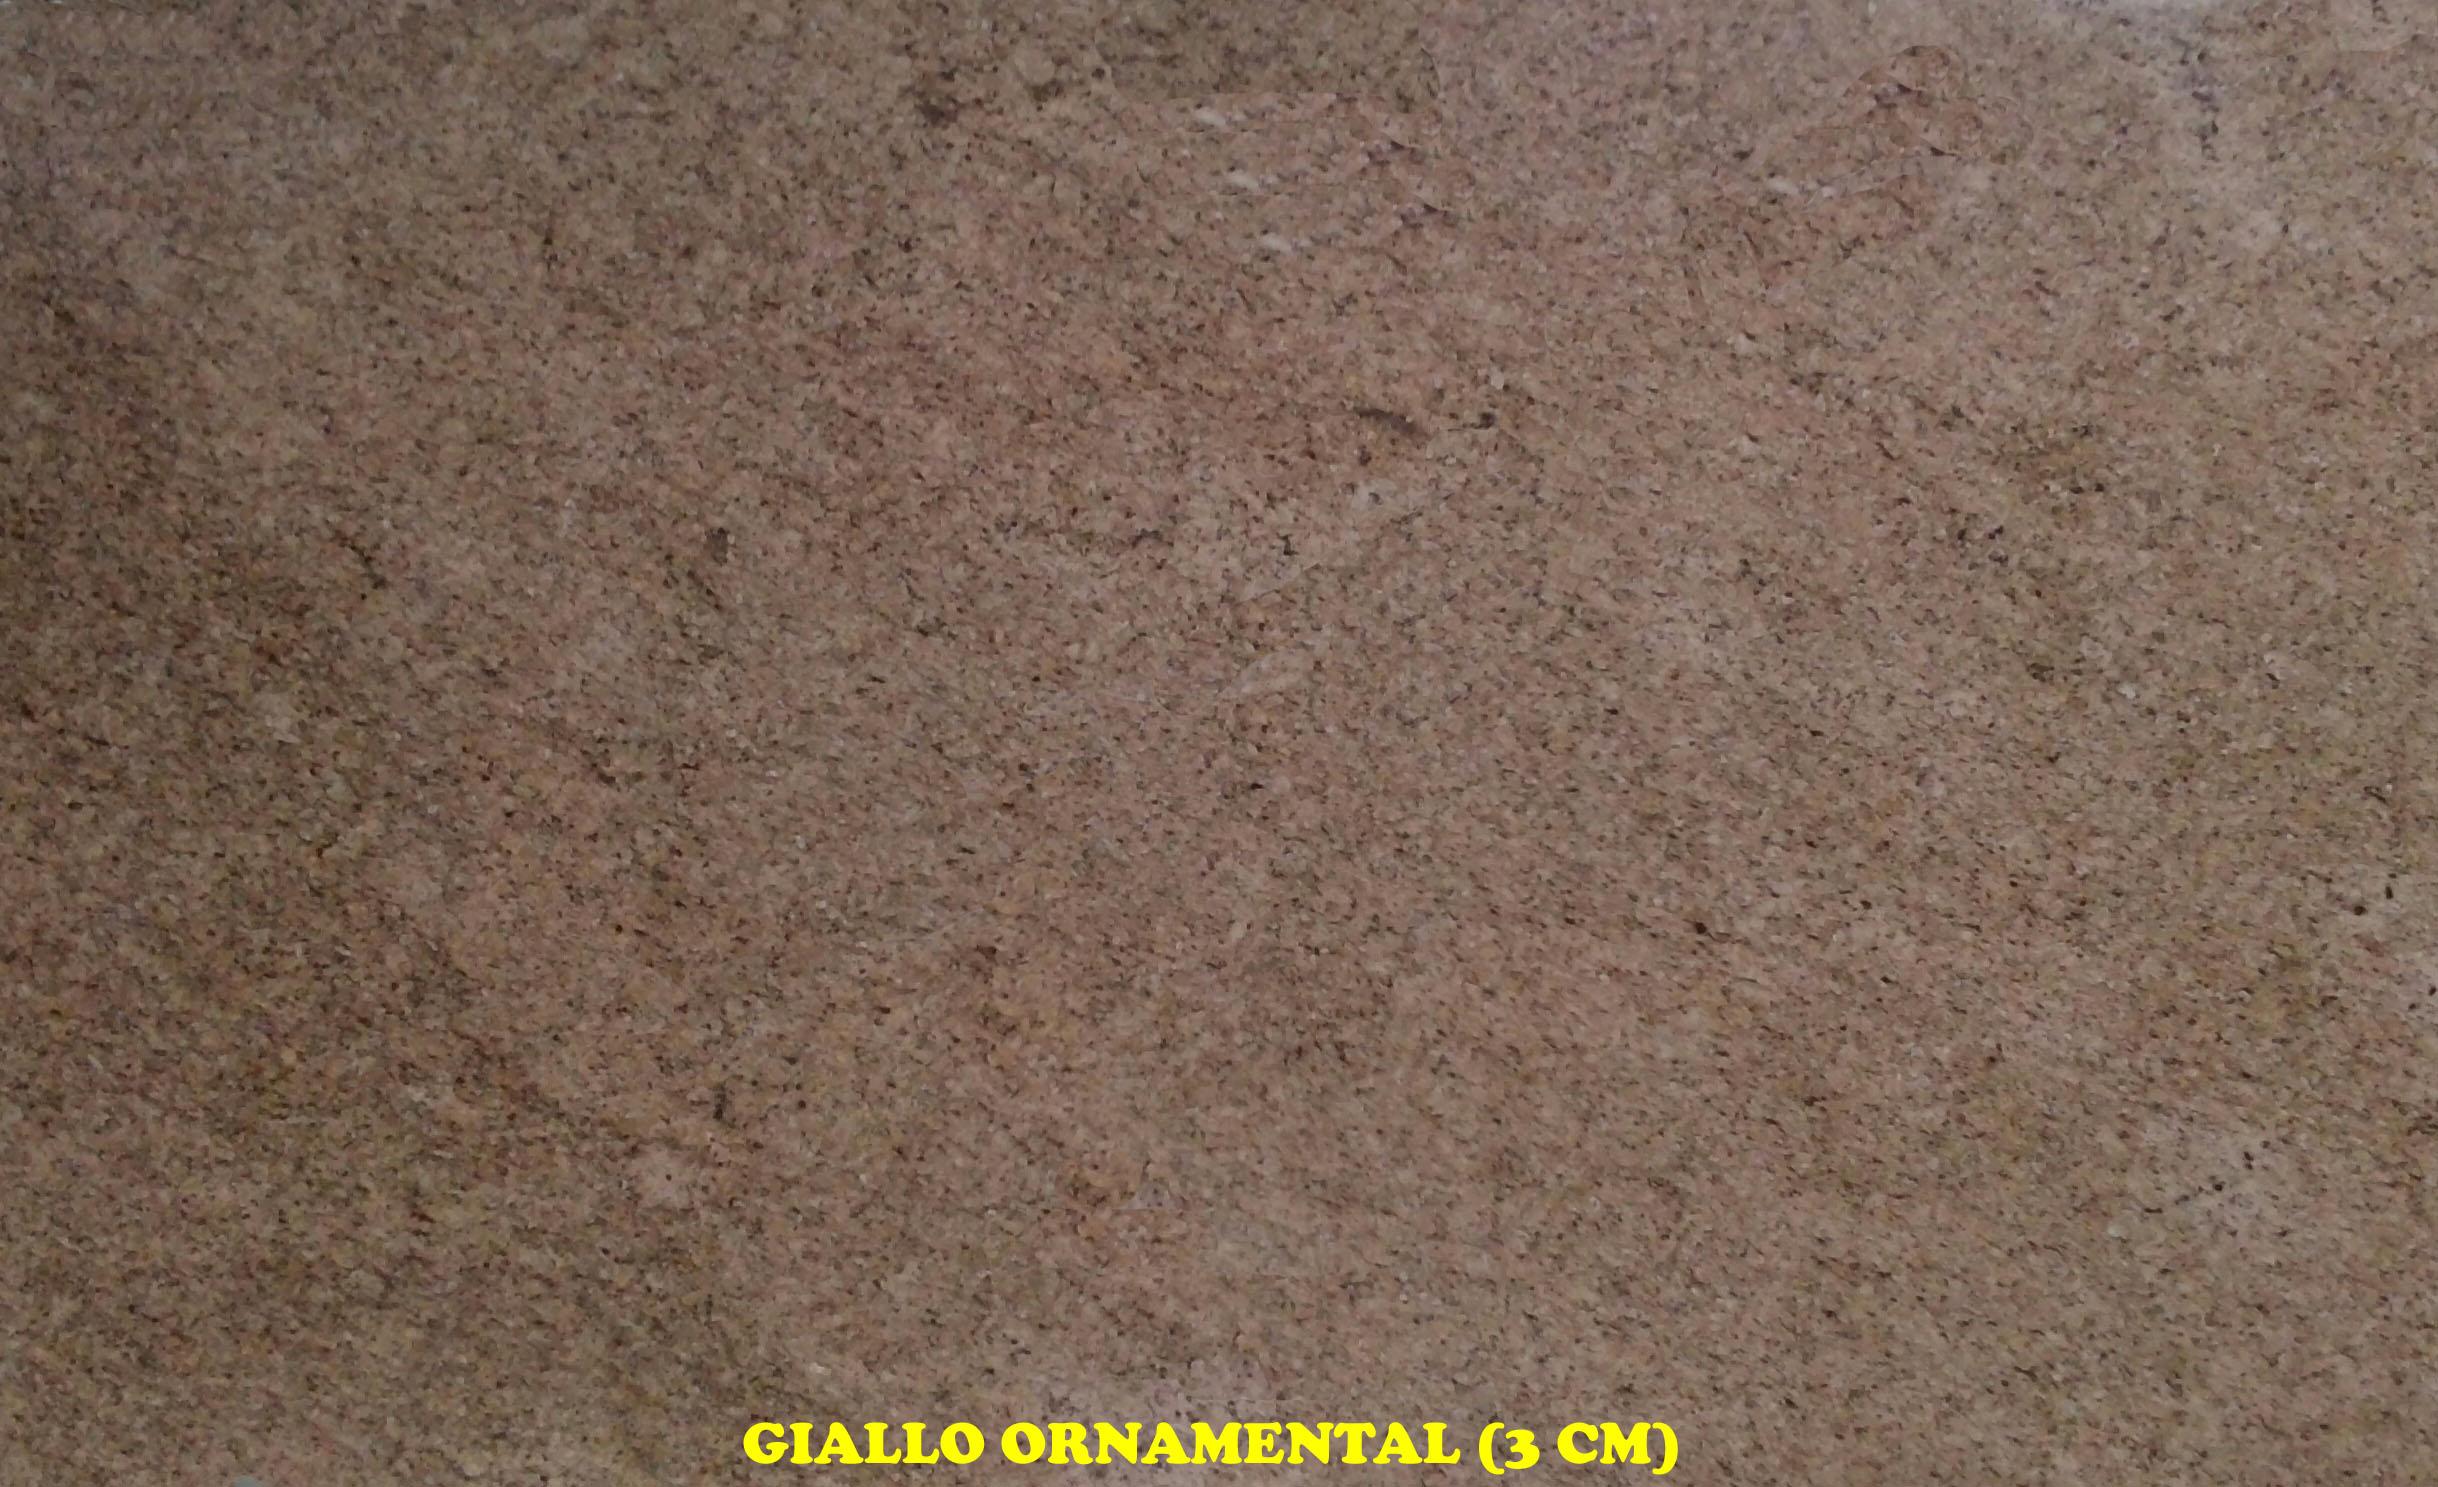 GIALLO ORNAMENTAL (3 CM) #8459.jpg